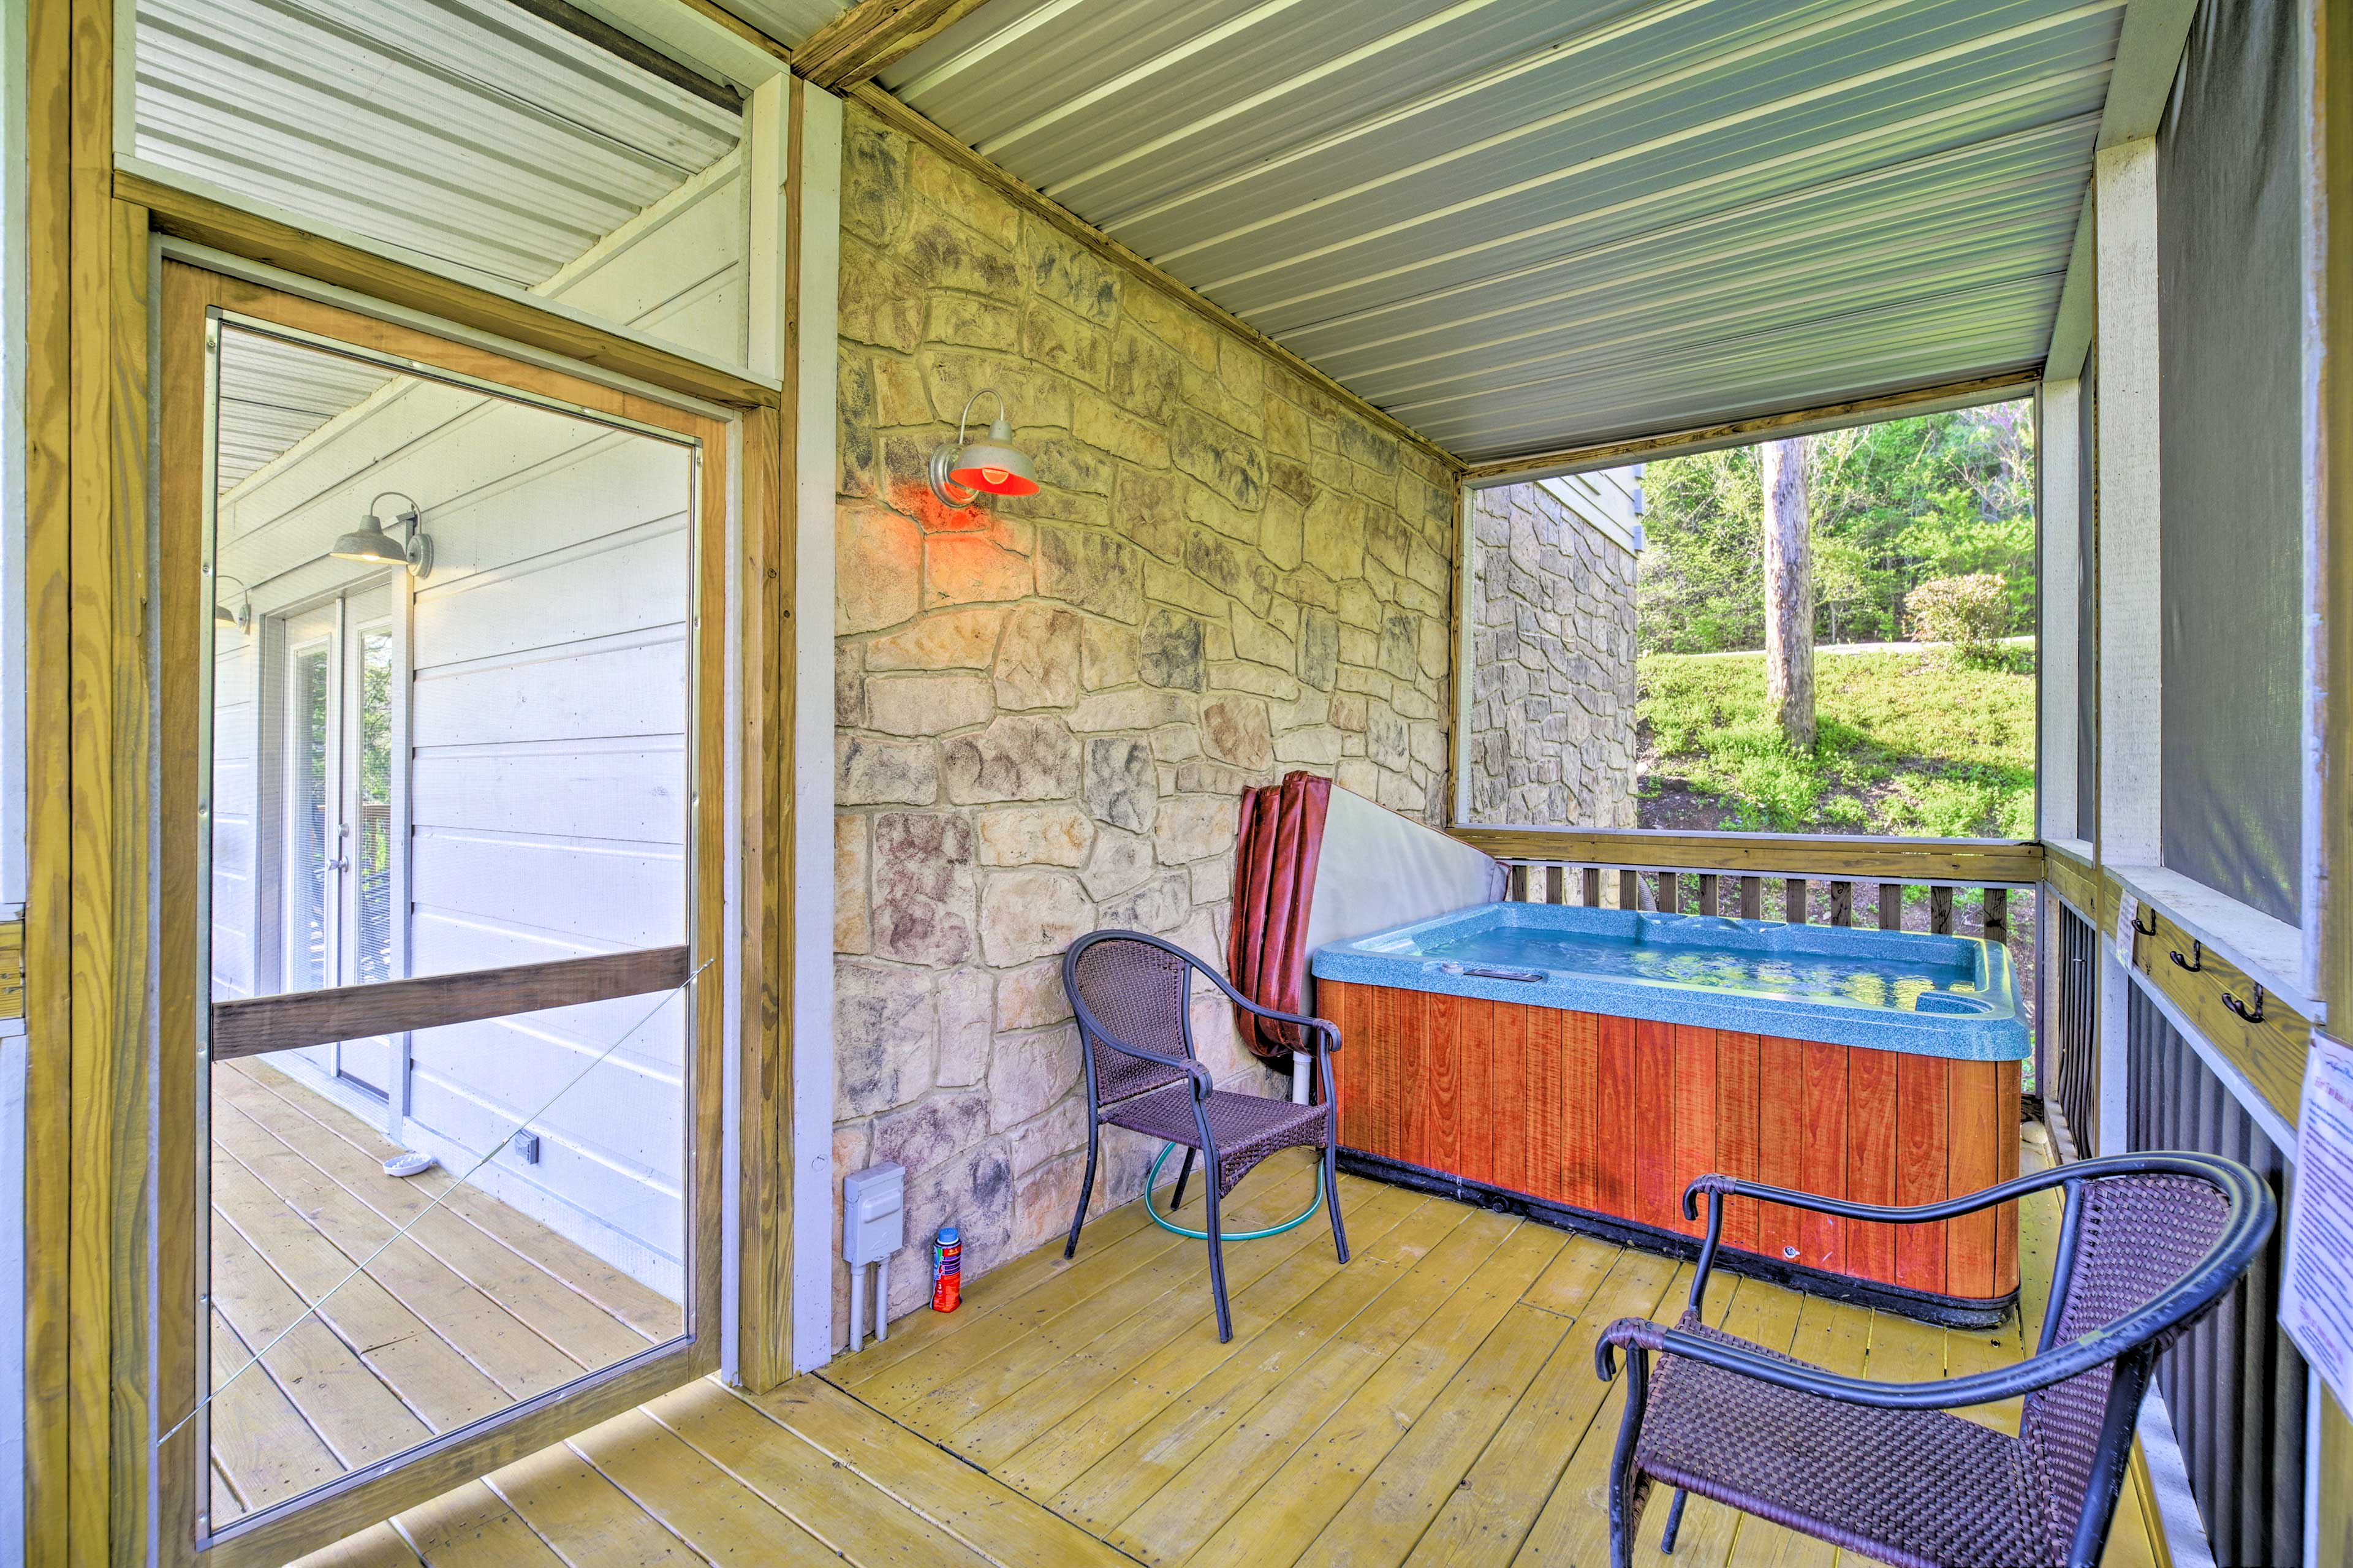 Take a dip in the private hot tub!